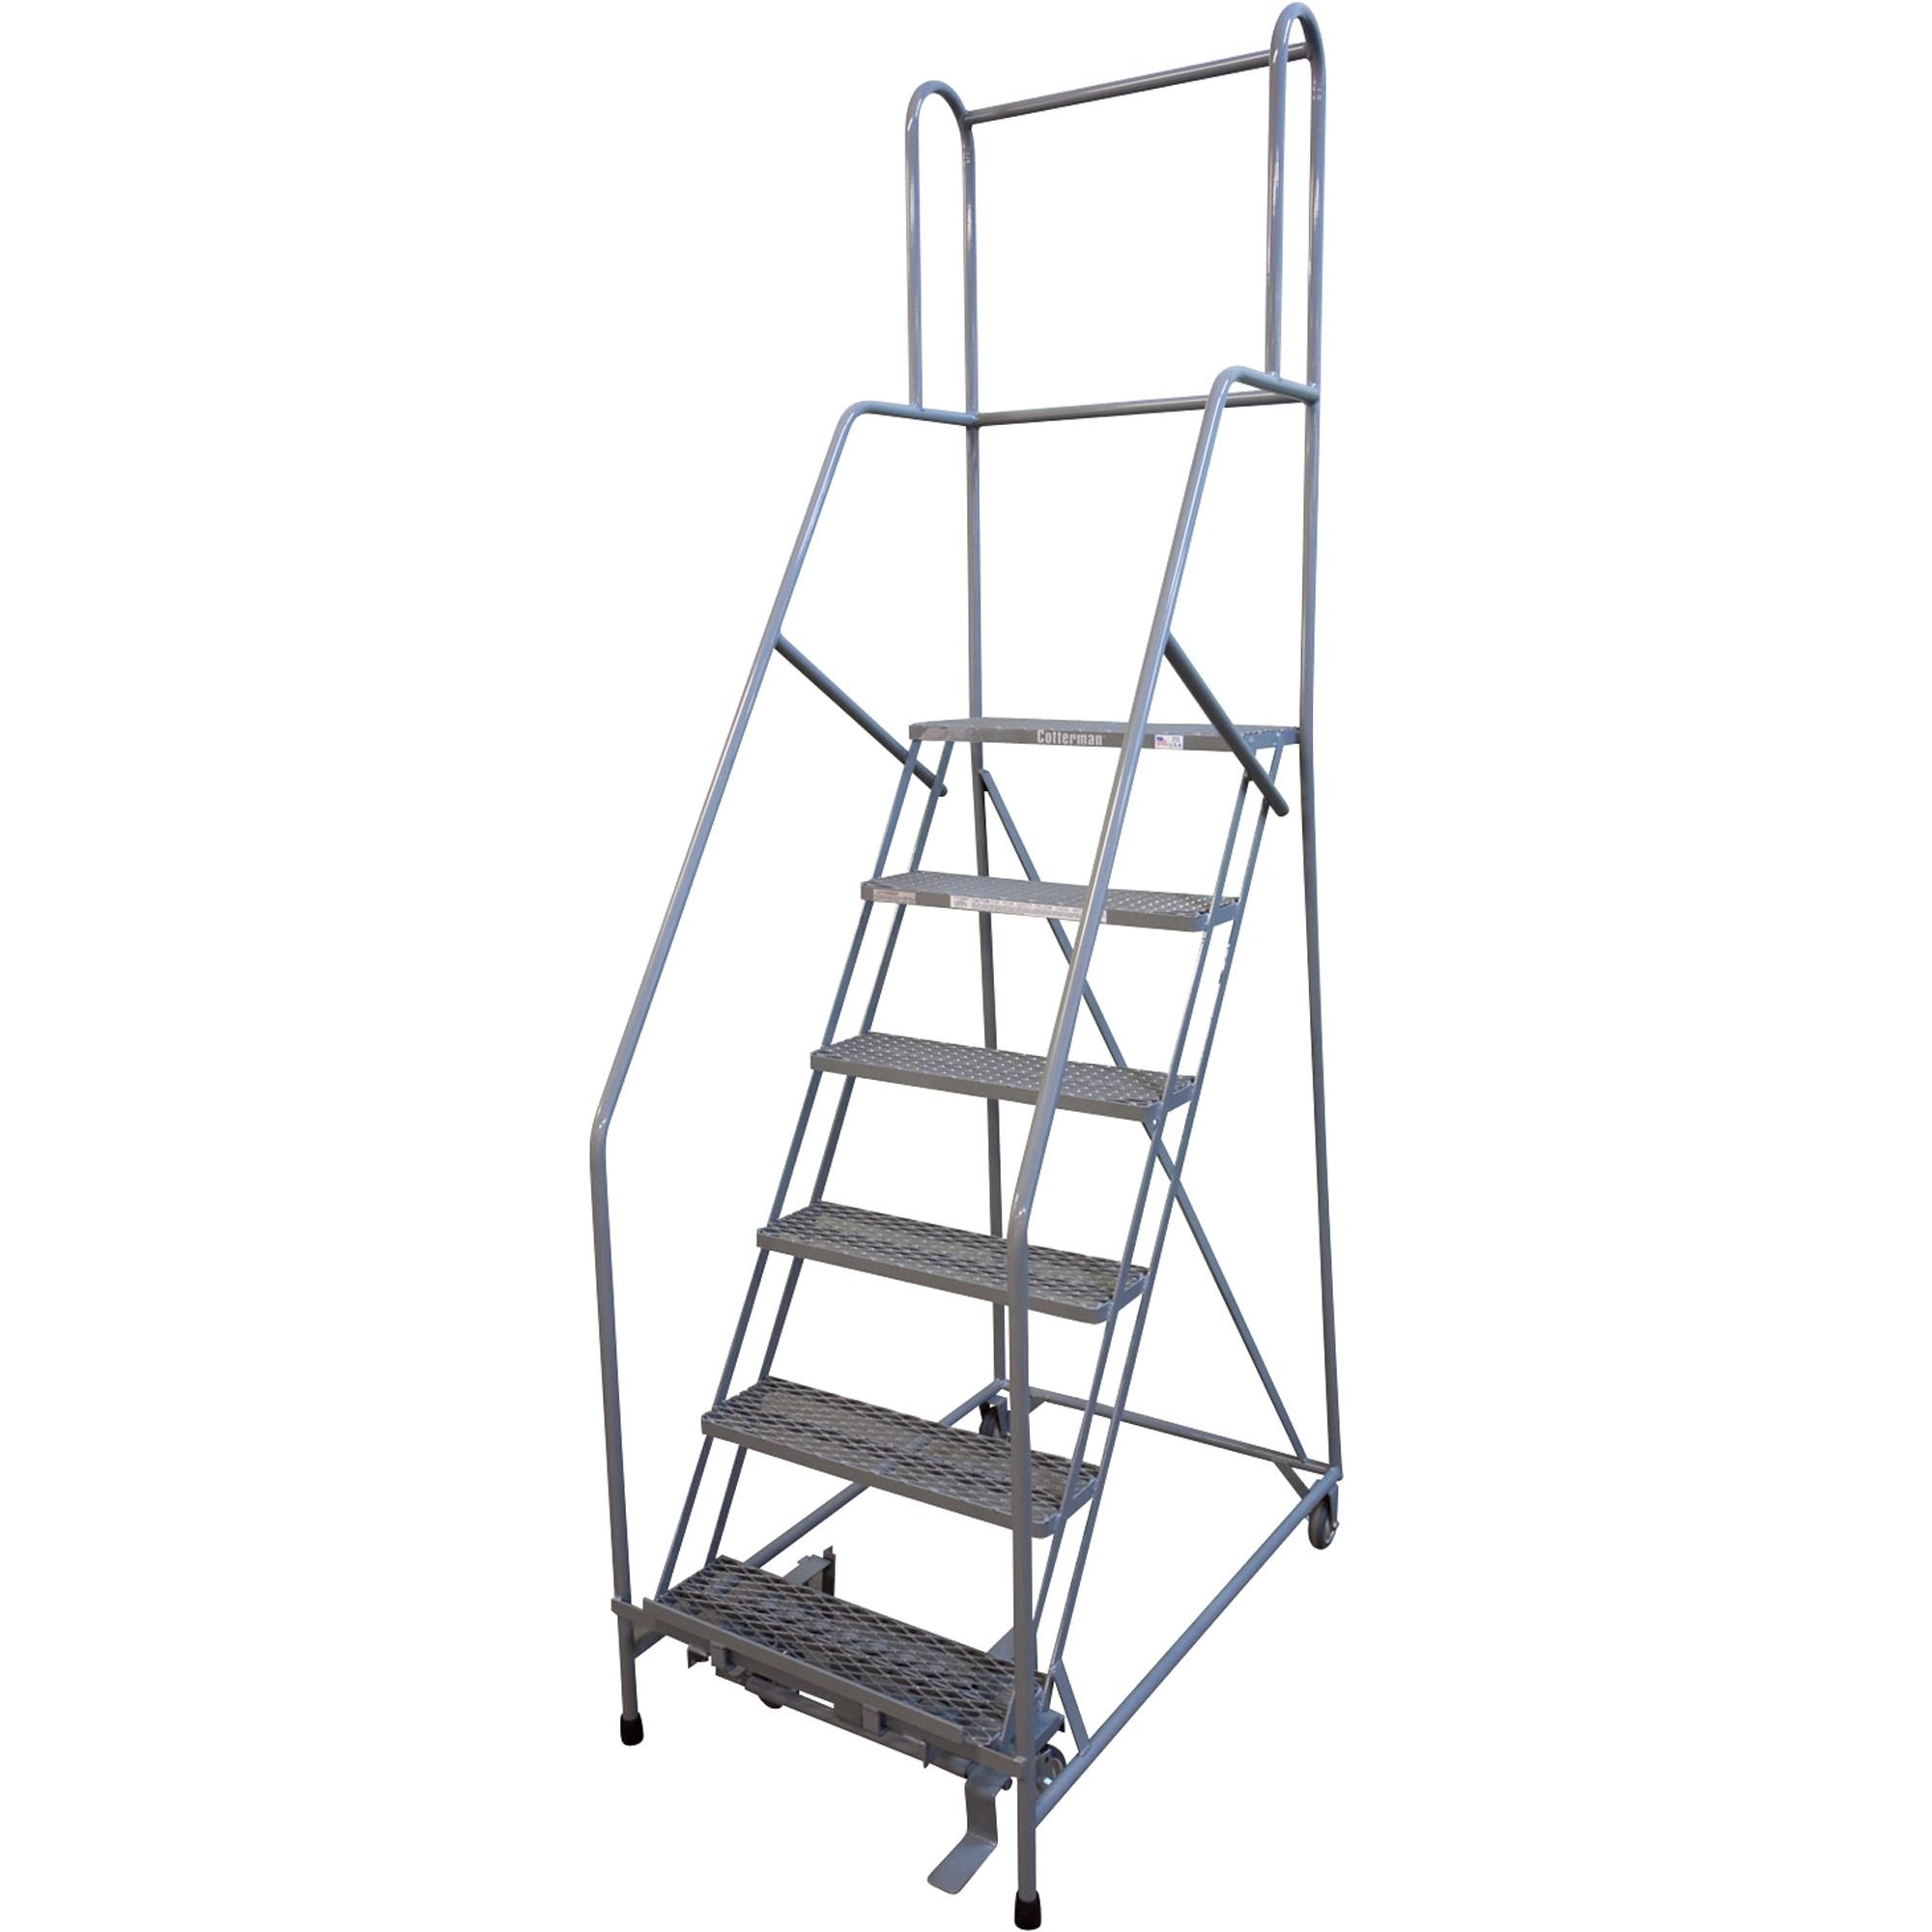 Library Ladder for Sale Craigslist Rolling Ladders Rolling Platform Ladders northern tool Equipment